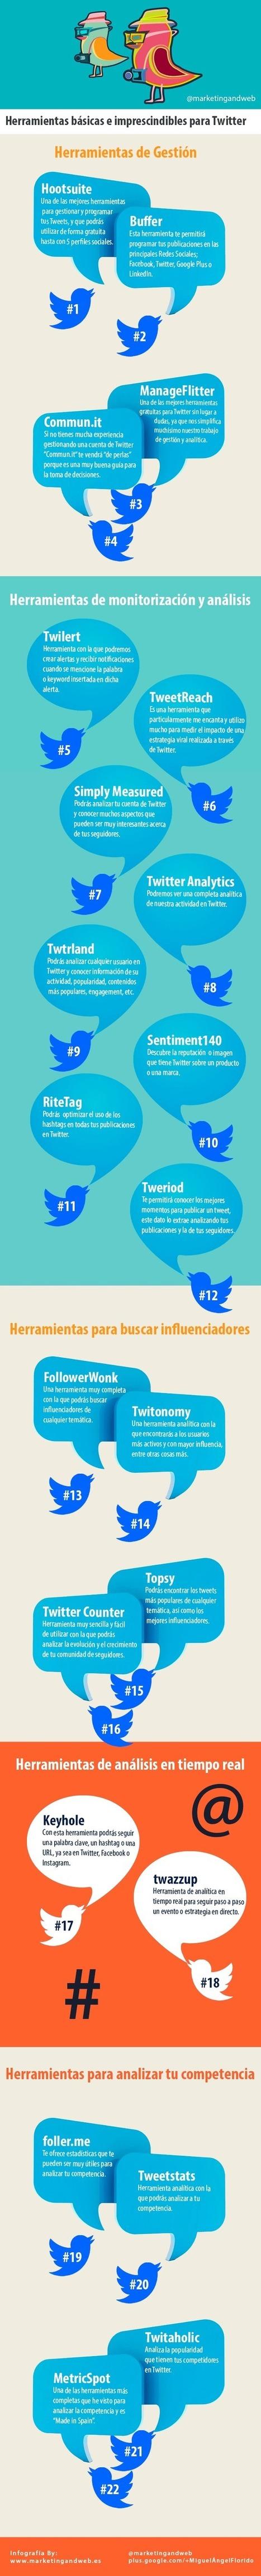 22 herramientas imprescindibles para Twitter | Bibliotecas Escolares Argentinas | Scoop.it